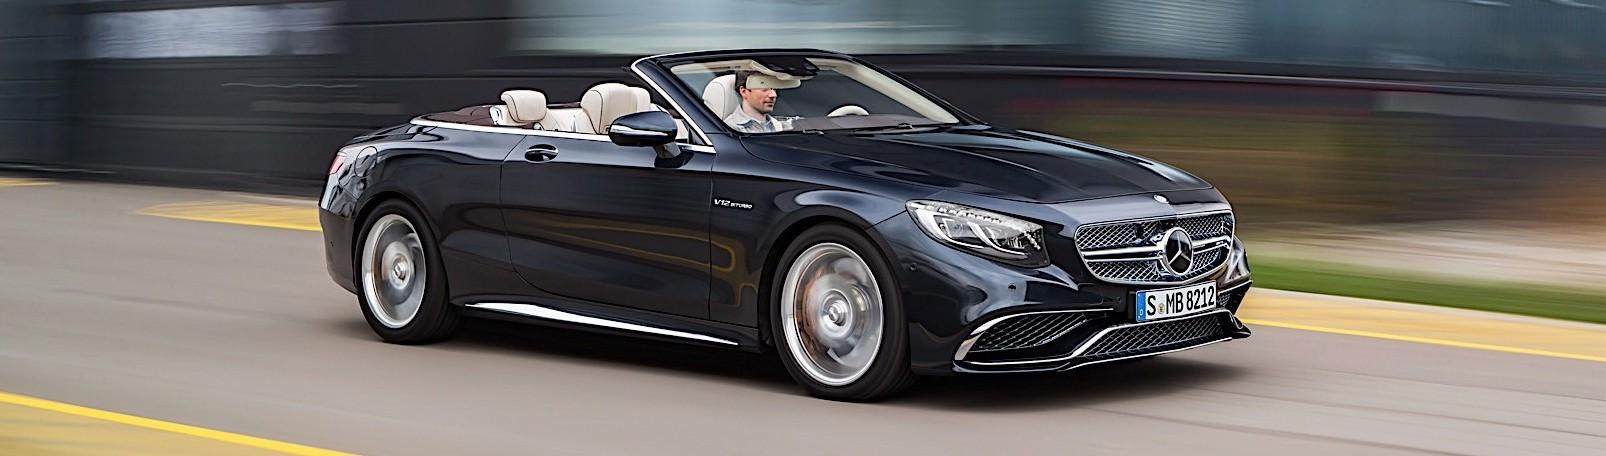 Five Heaviest Convertible Sports Cars Available In Europe In - Convertible sports cars